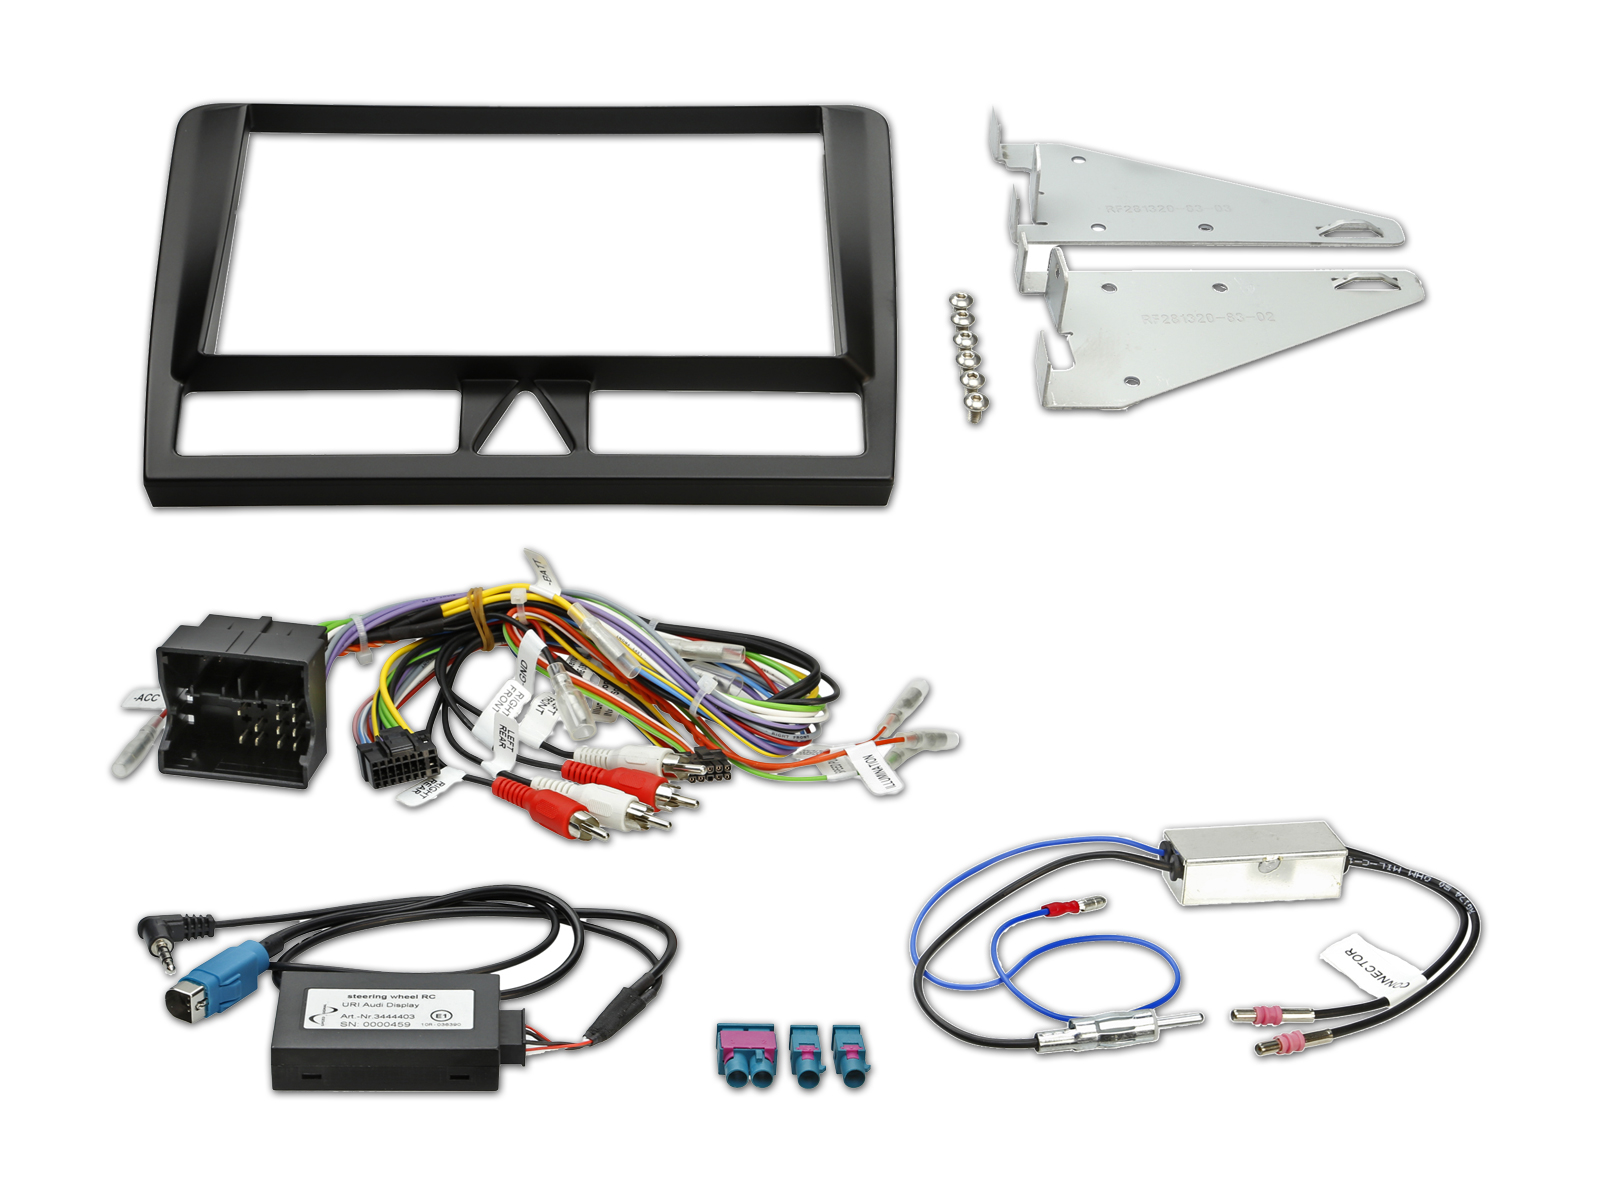 Kit D Installation Pour Ine W928r Audi A3 Alpine Kit